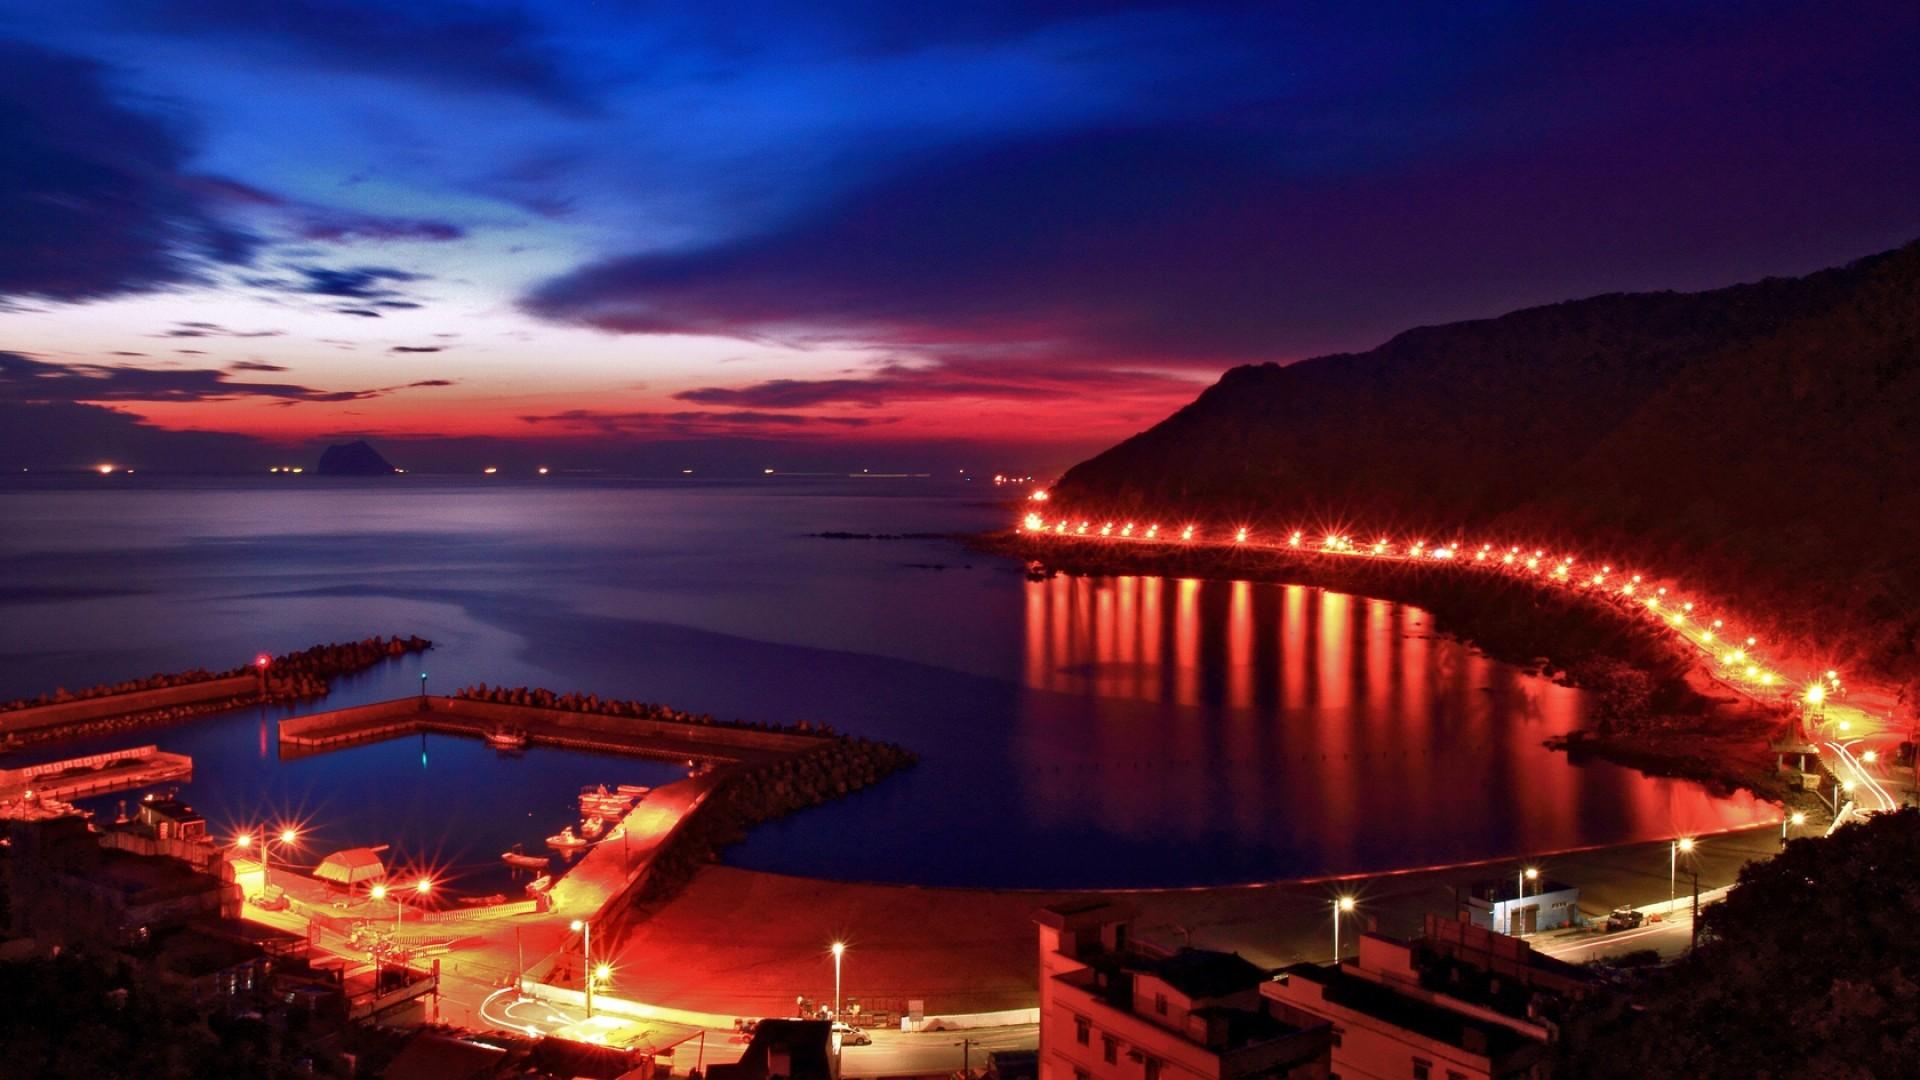 Wallpaper beach, lights, sky, pier, night, city lights